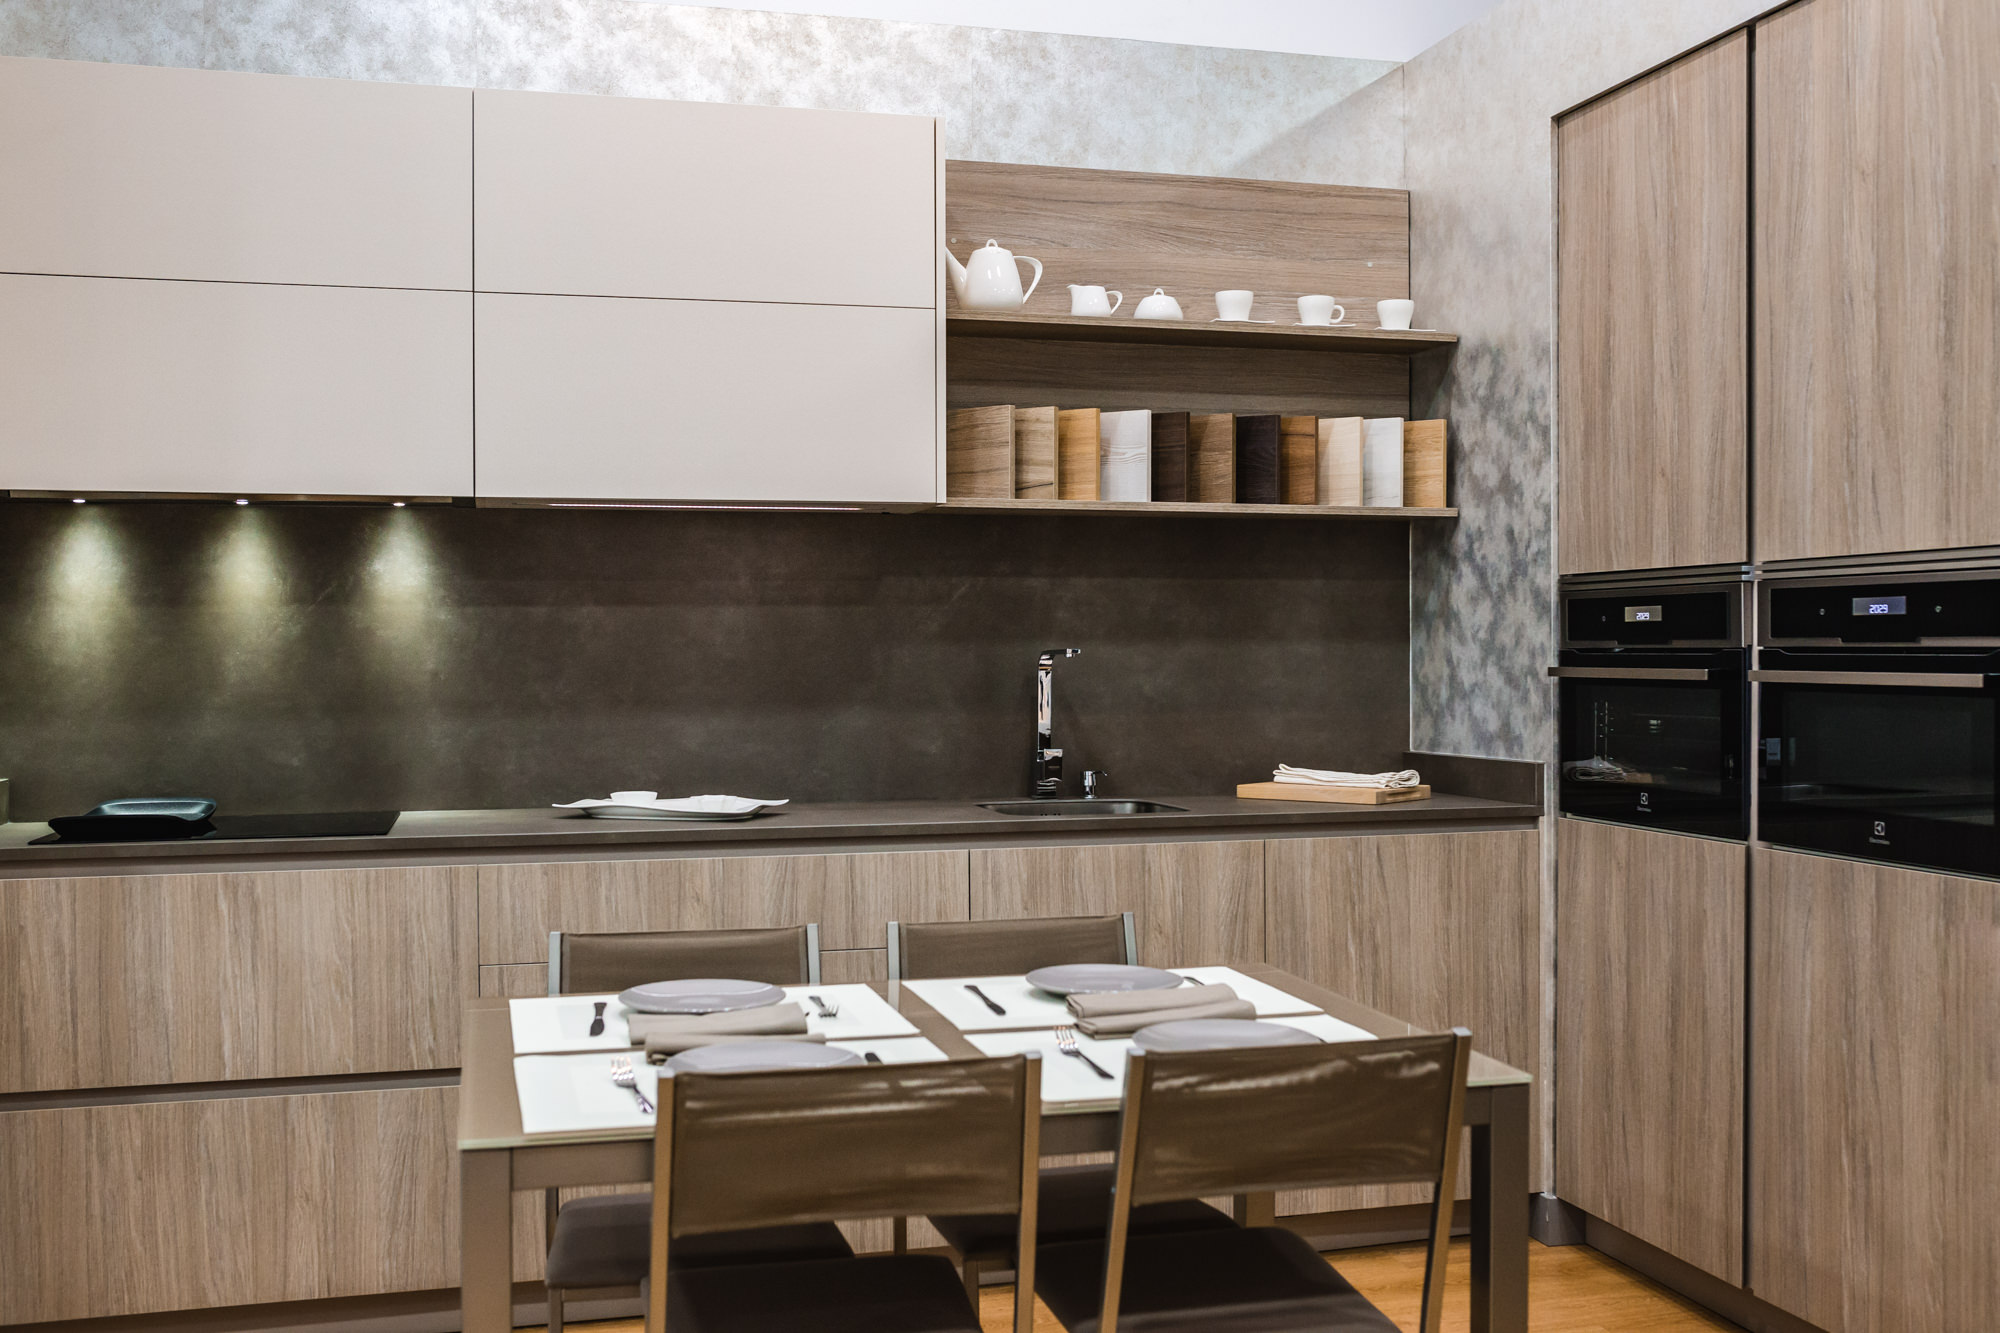 Rinconeras de cocina modernas trendy video con herraje for Rinconeras de cocina modernas